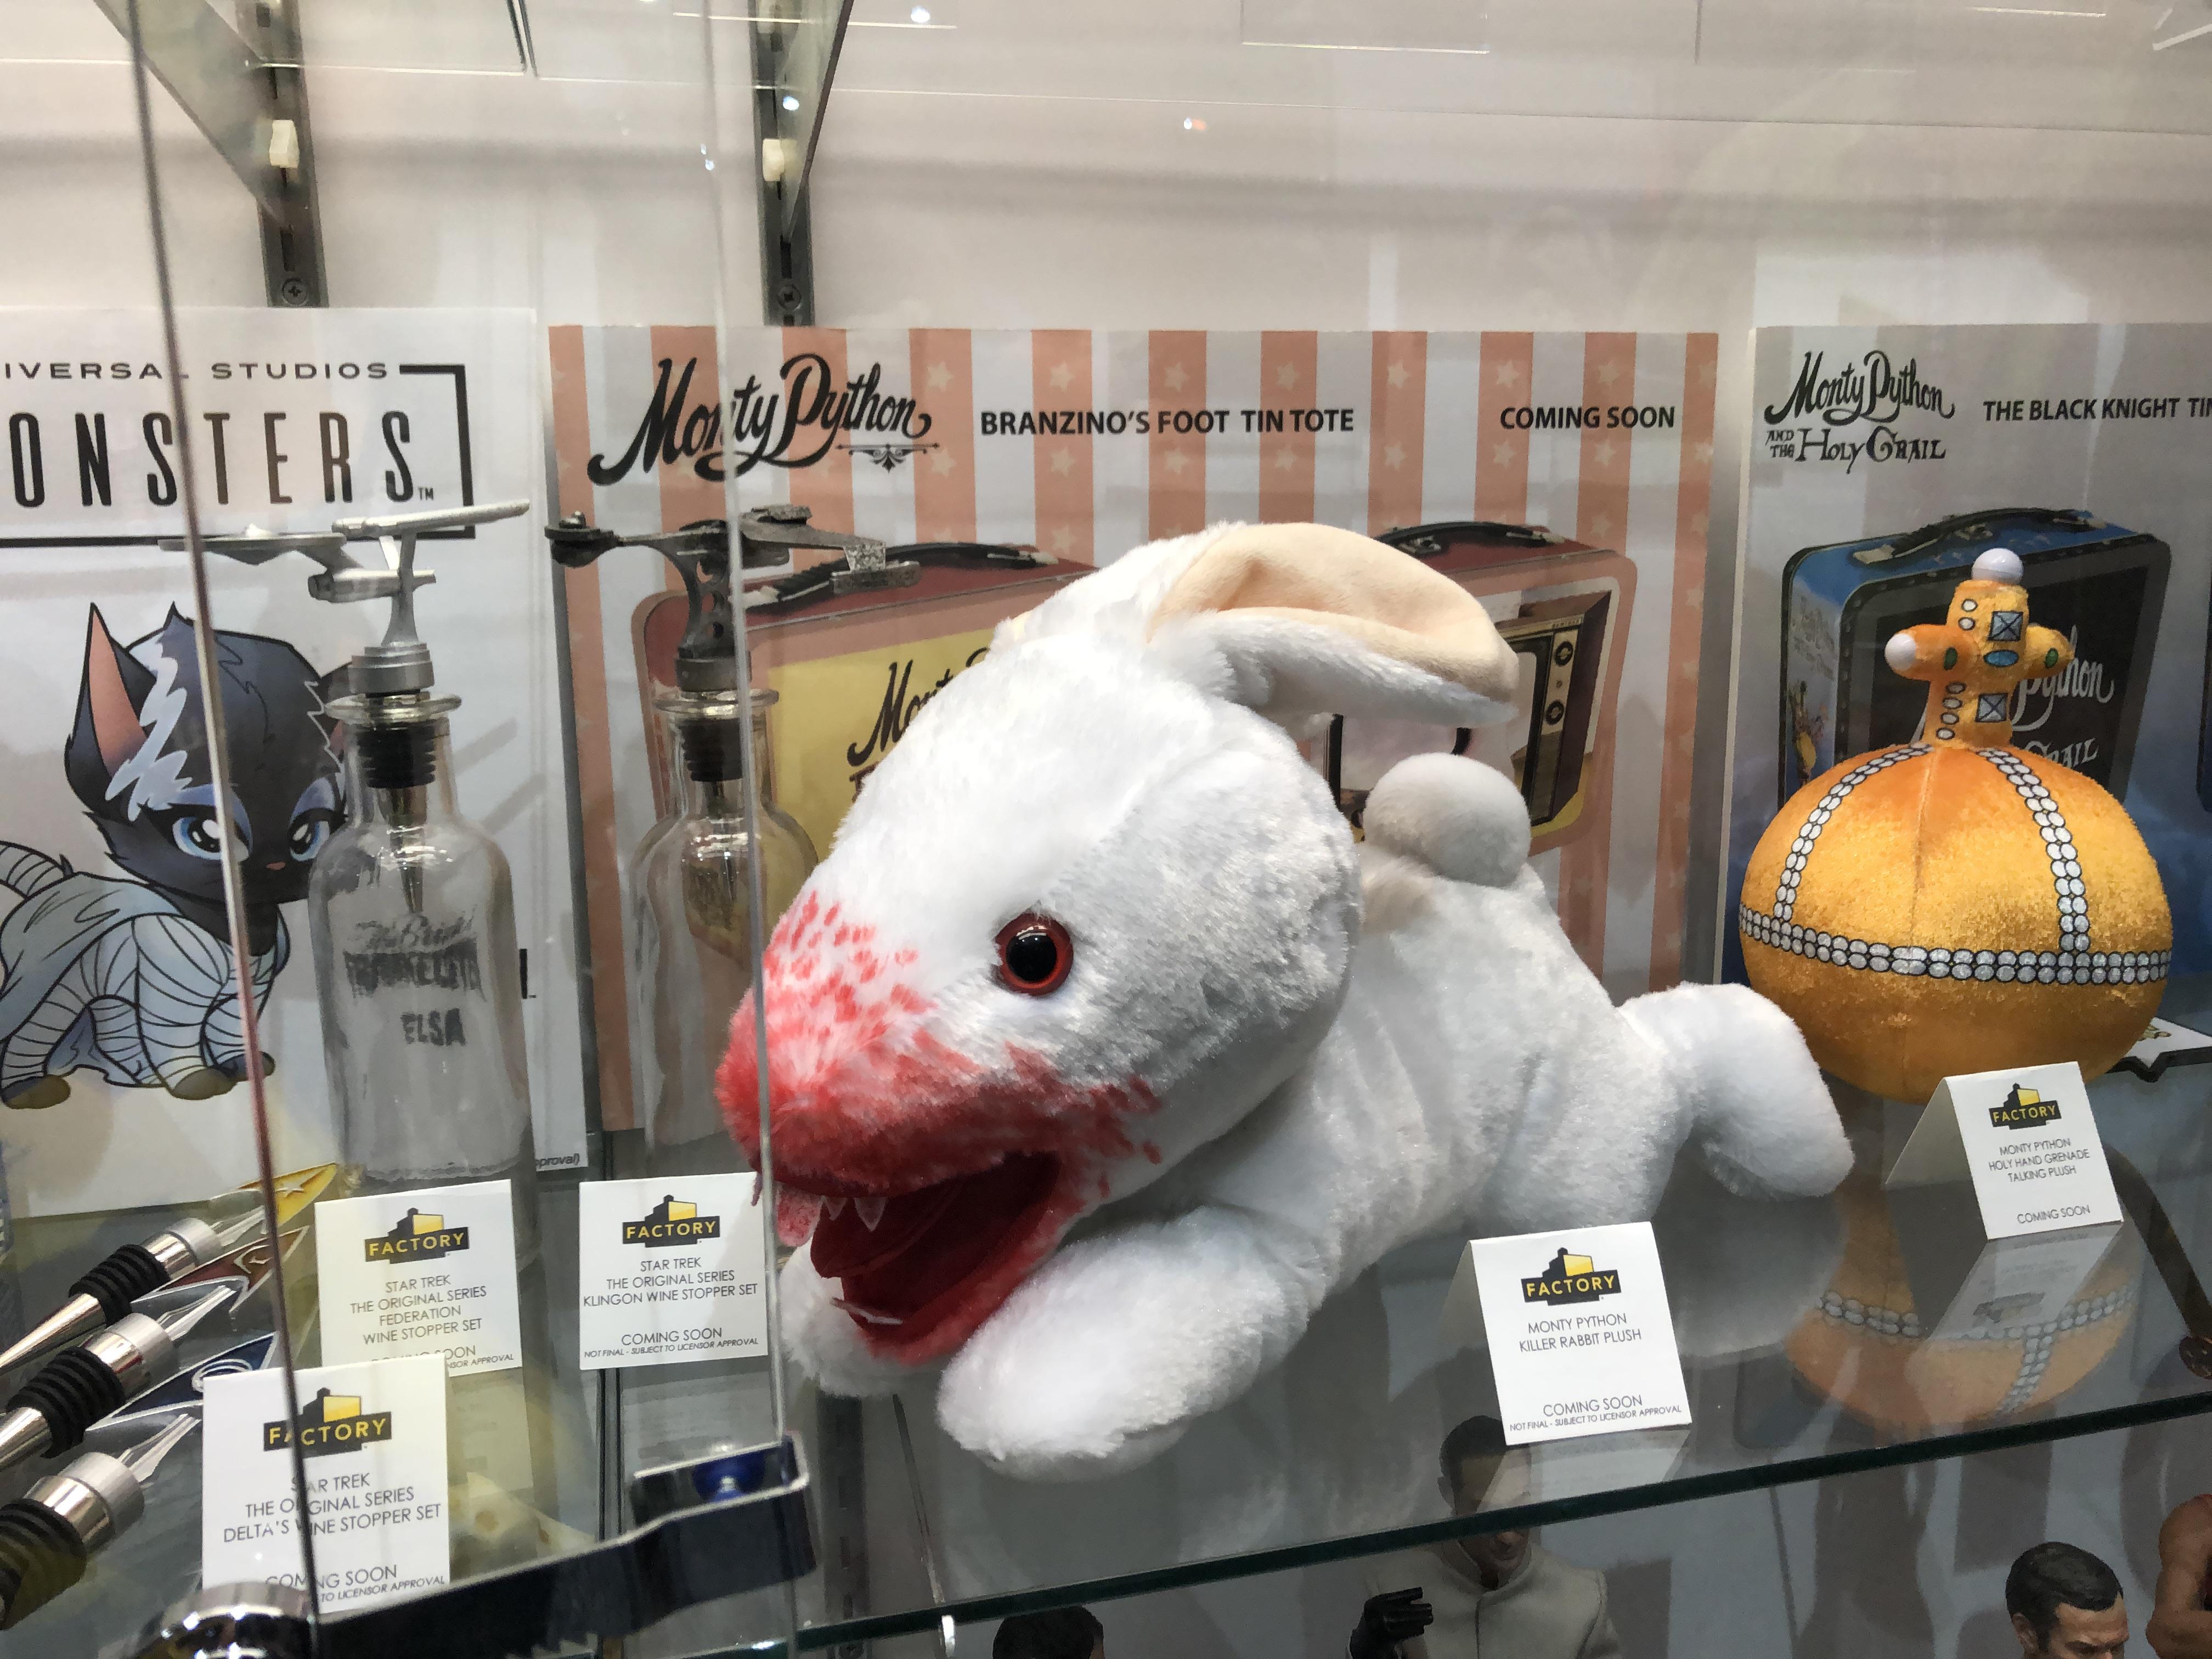 Monty Python Killer Rabbit Caerbannog plush